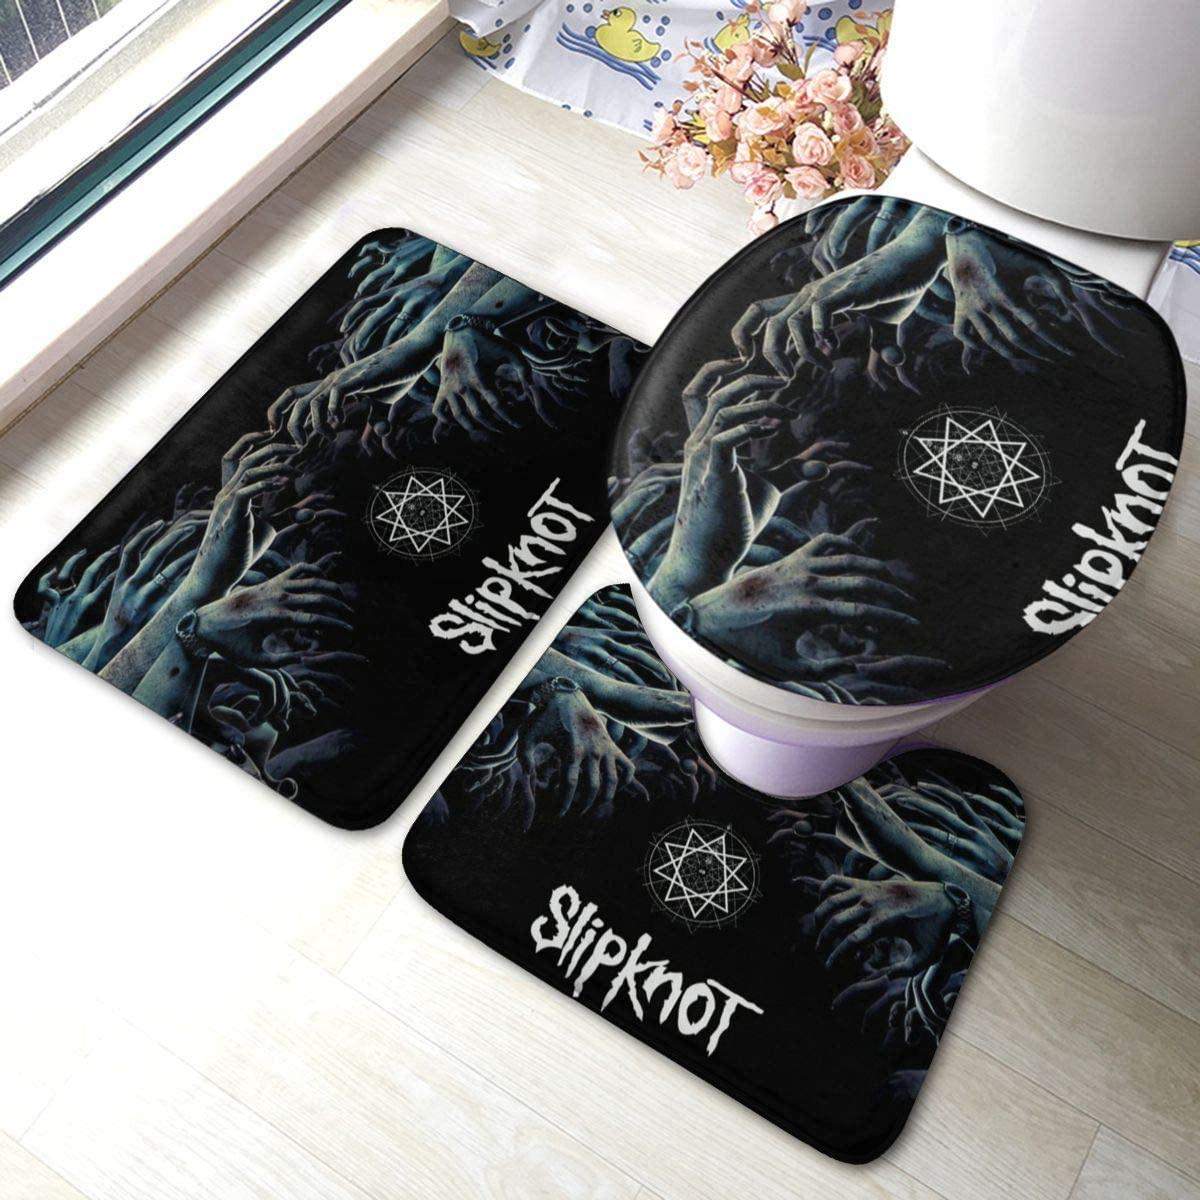 PTERTRANS Slipknot Bath Rug Sets 3-Piece, Bathroom Soft Non Slip and Absorbent Bath Mat Set, Carpet, Floor Mat